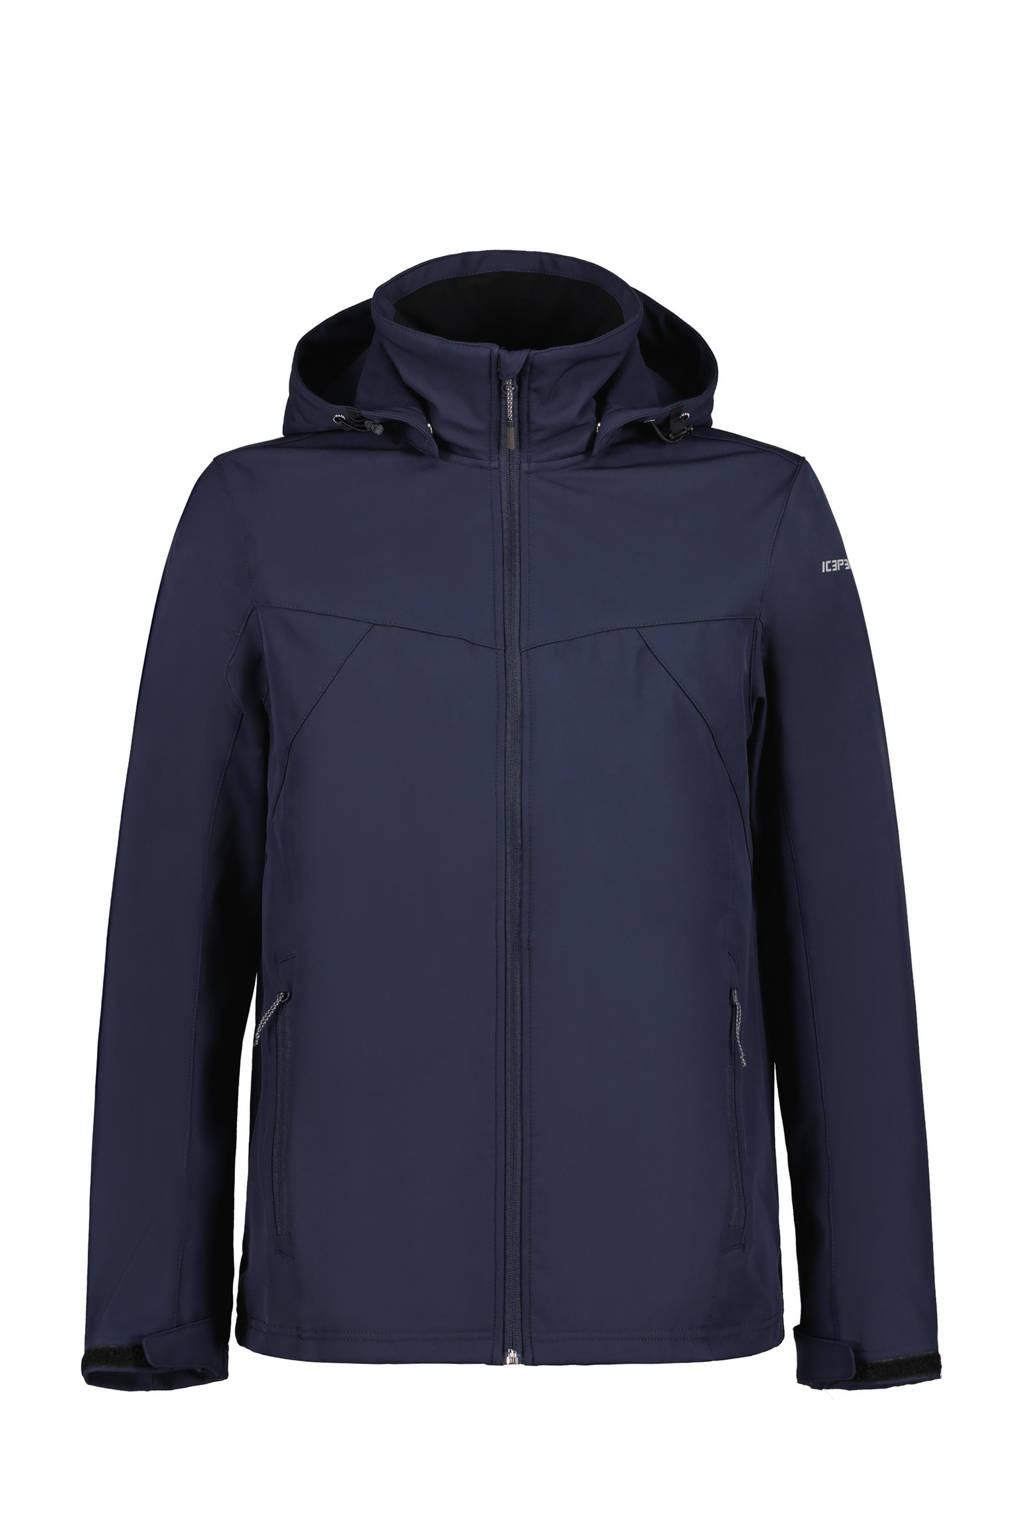 Icepeak softshell jas Brimfield donkerblauw, Donkerblauw